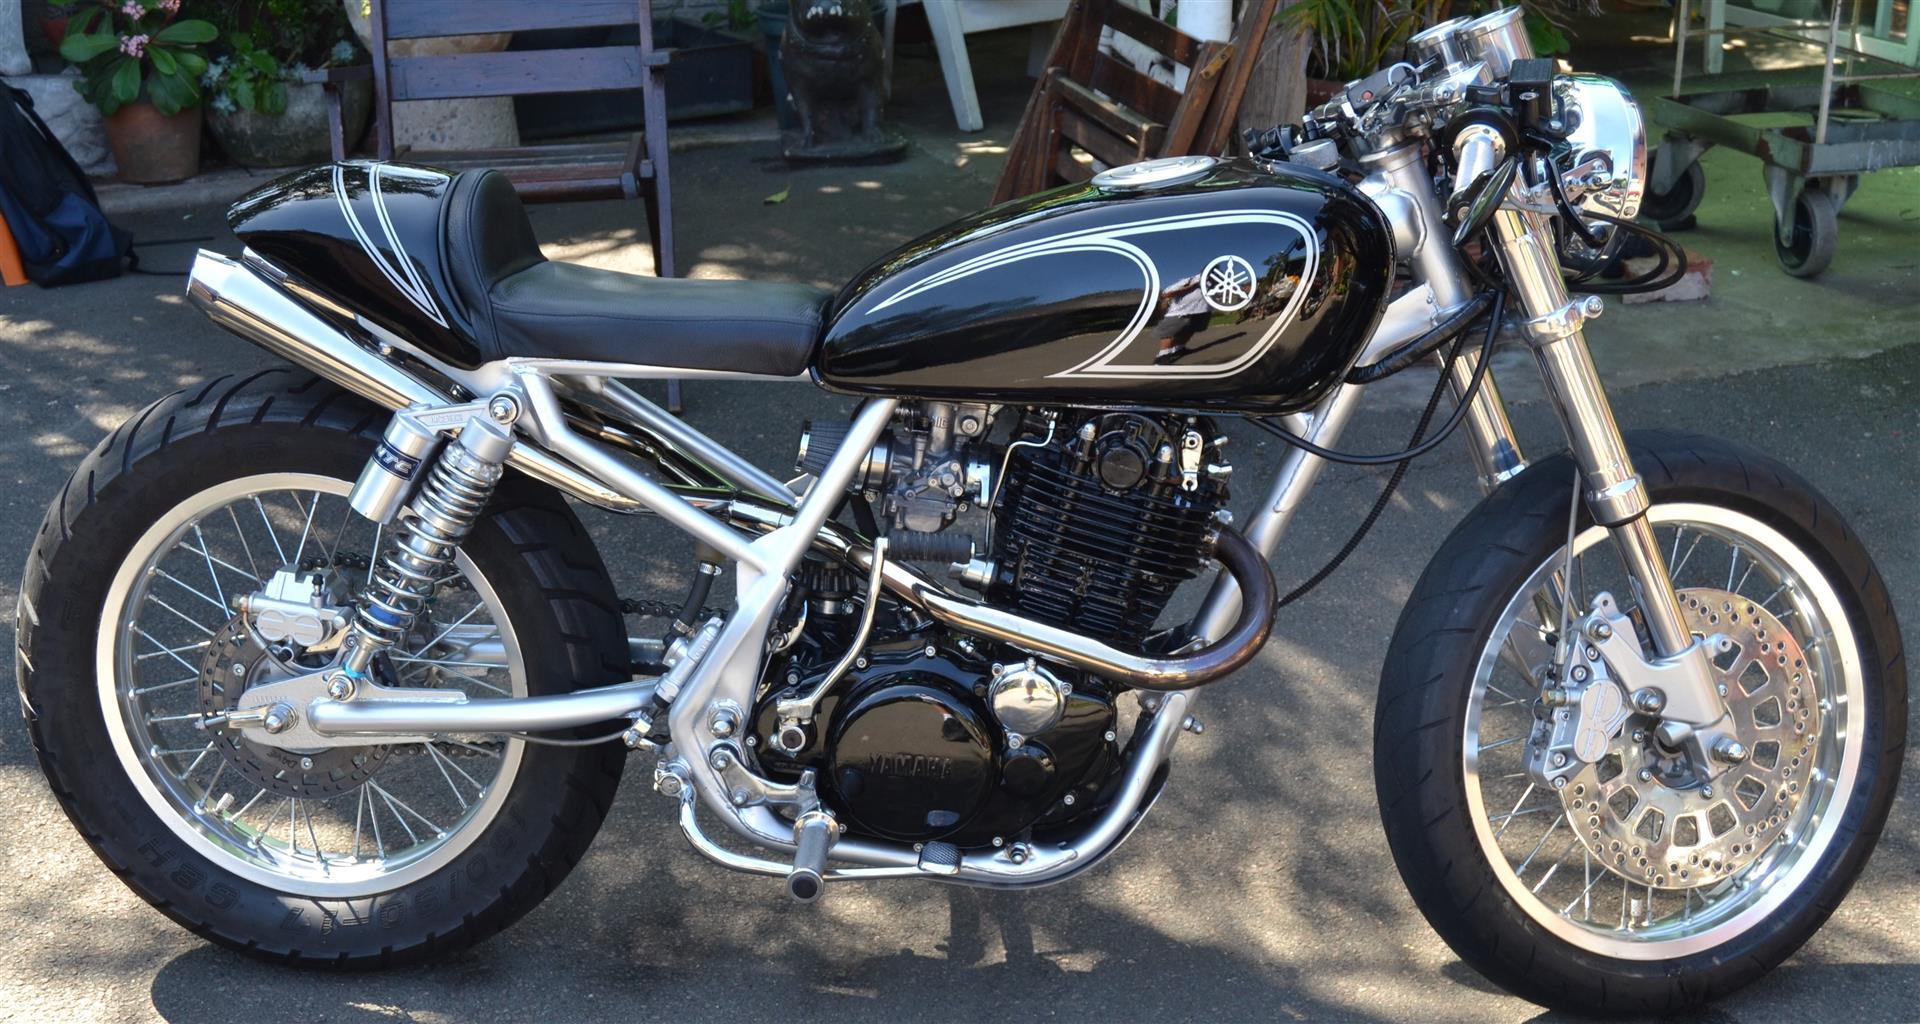 Yamaha Cafe Racer For Sale South Africa